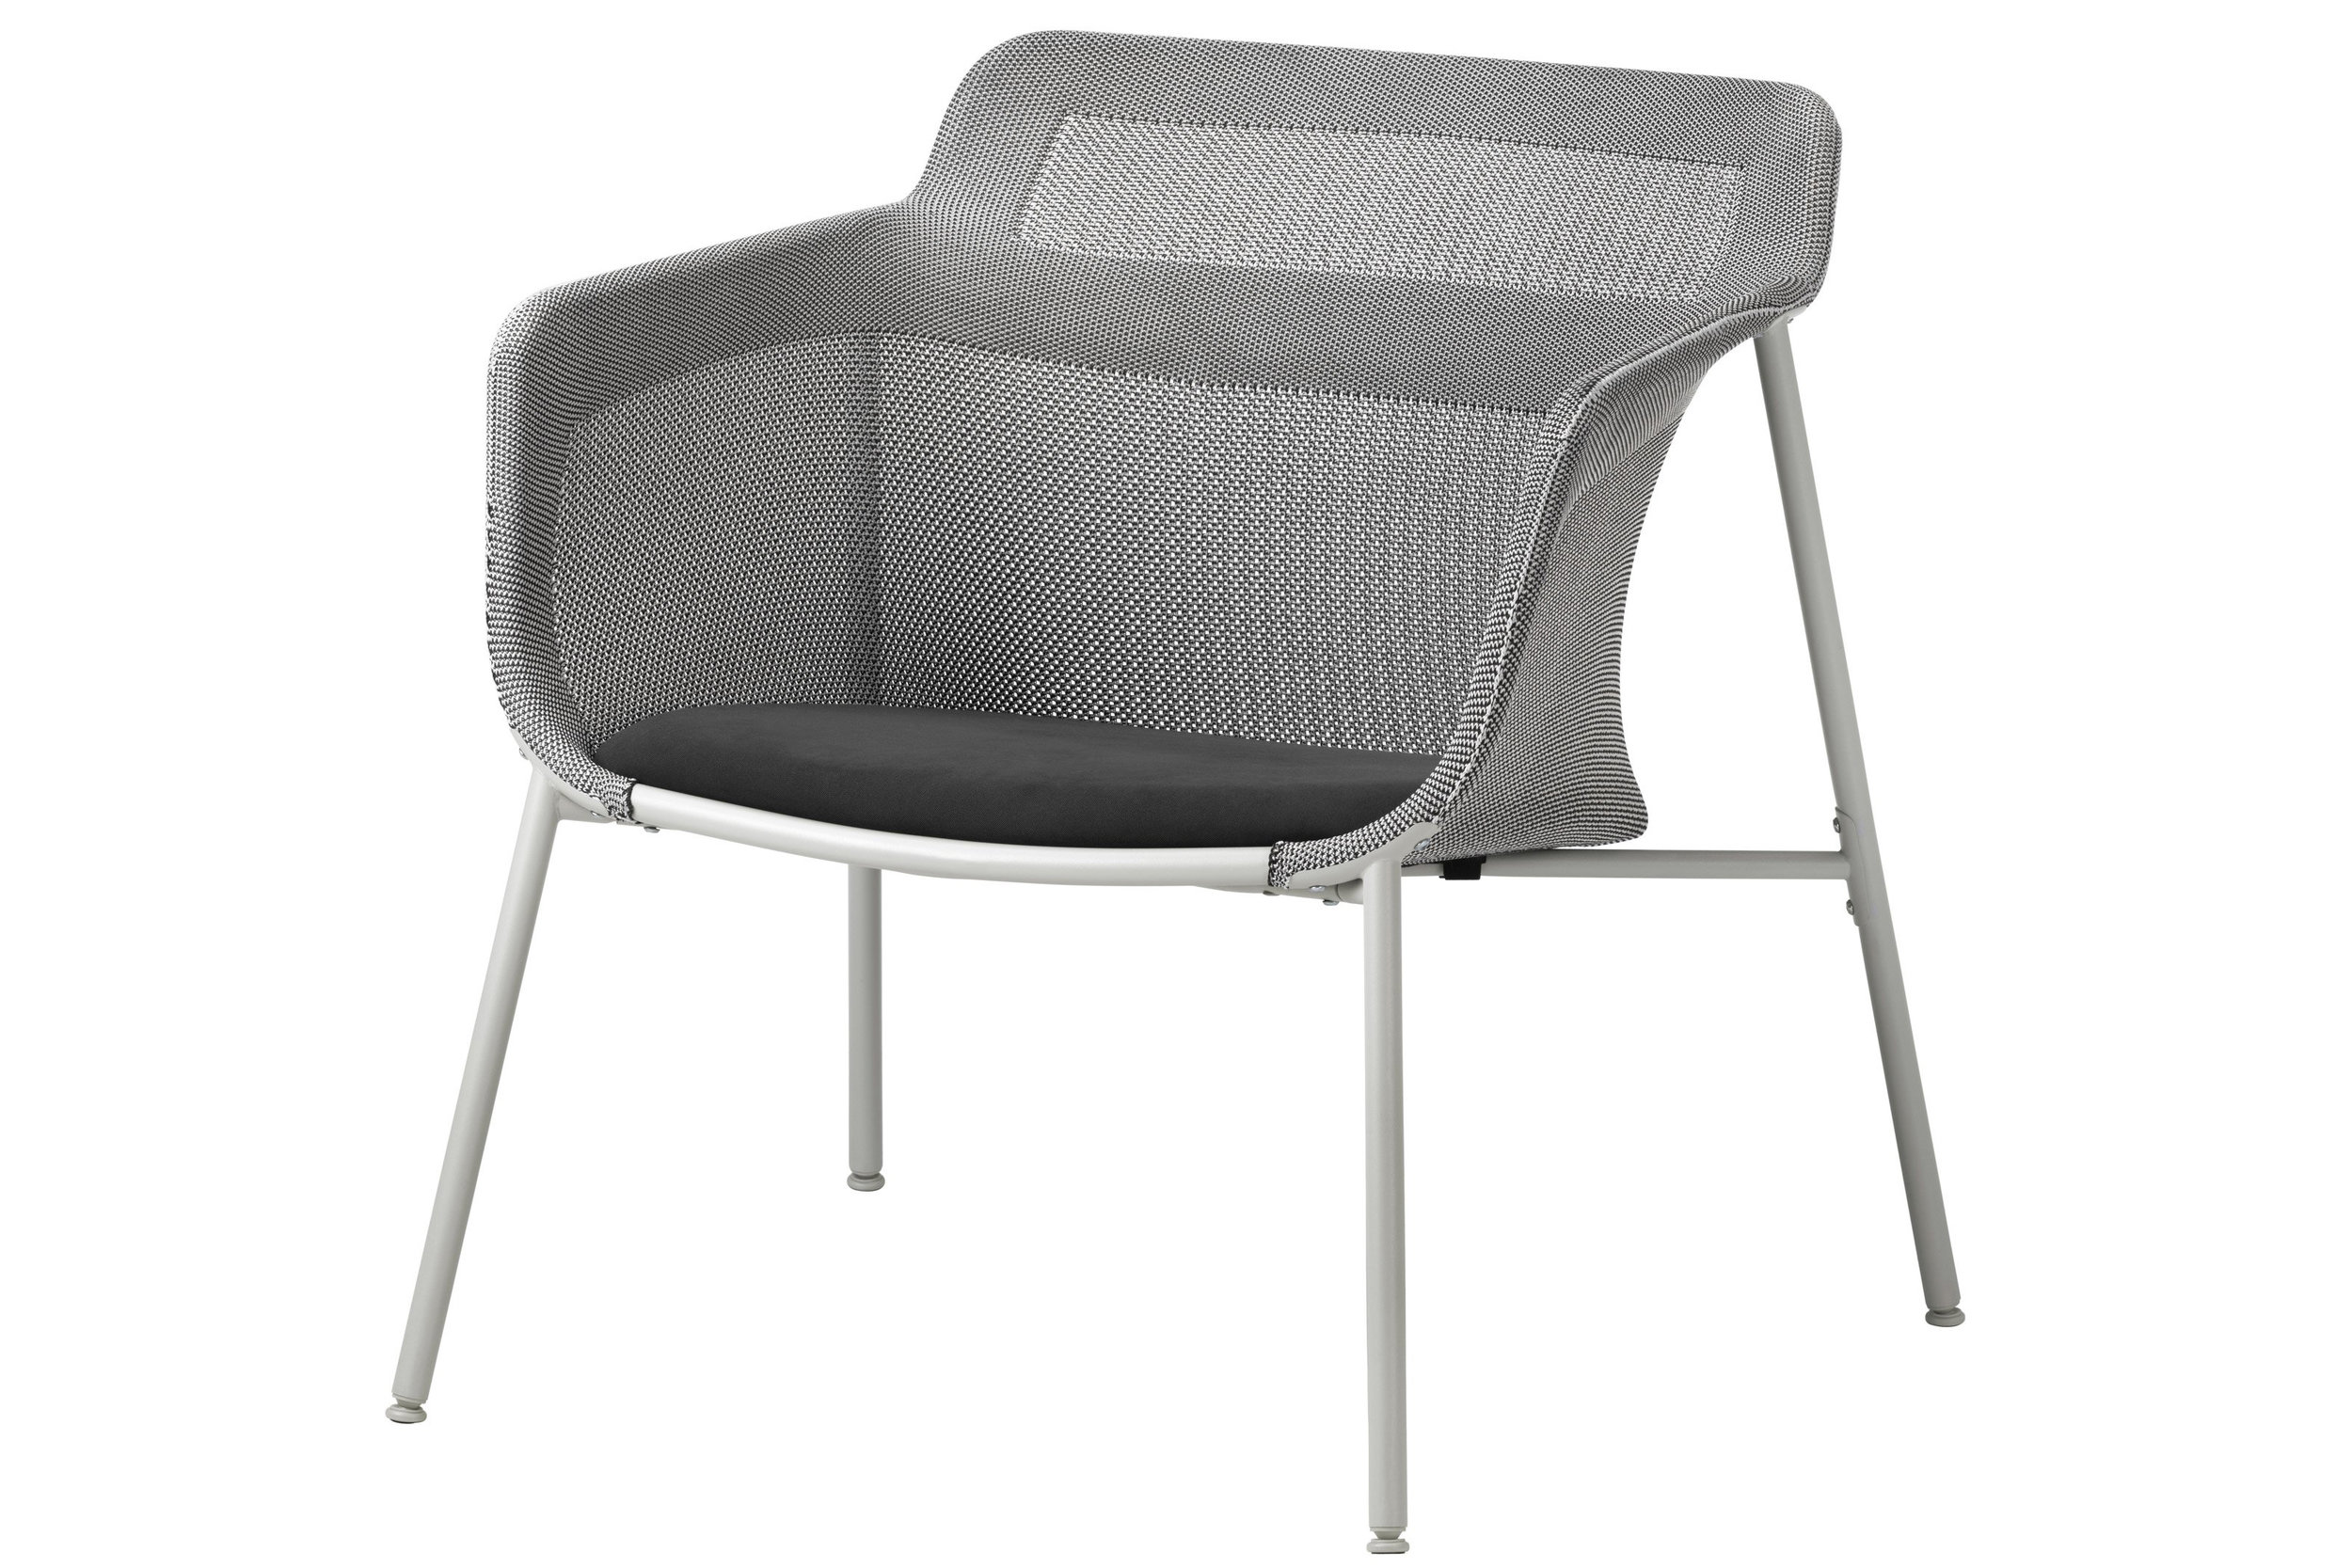 ikea-ps-2017-matali-crasset-furniture-chair-design_dezeen_2364_col_0.jpg